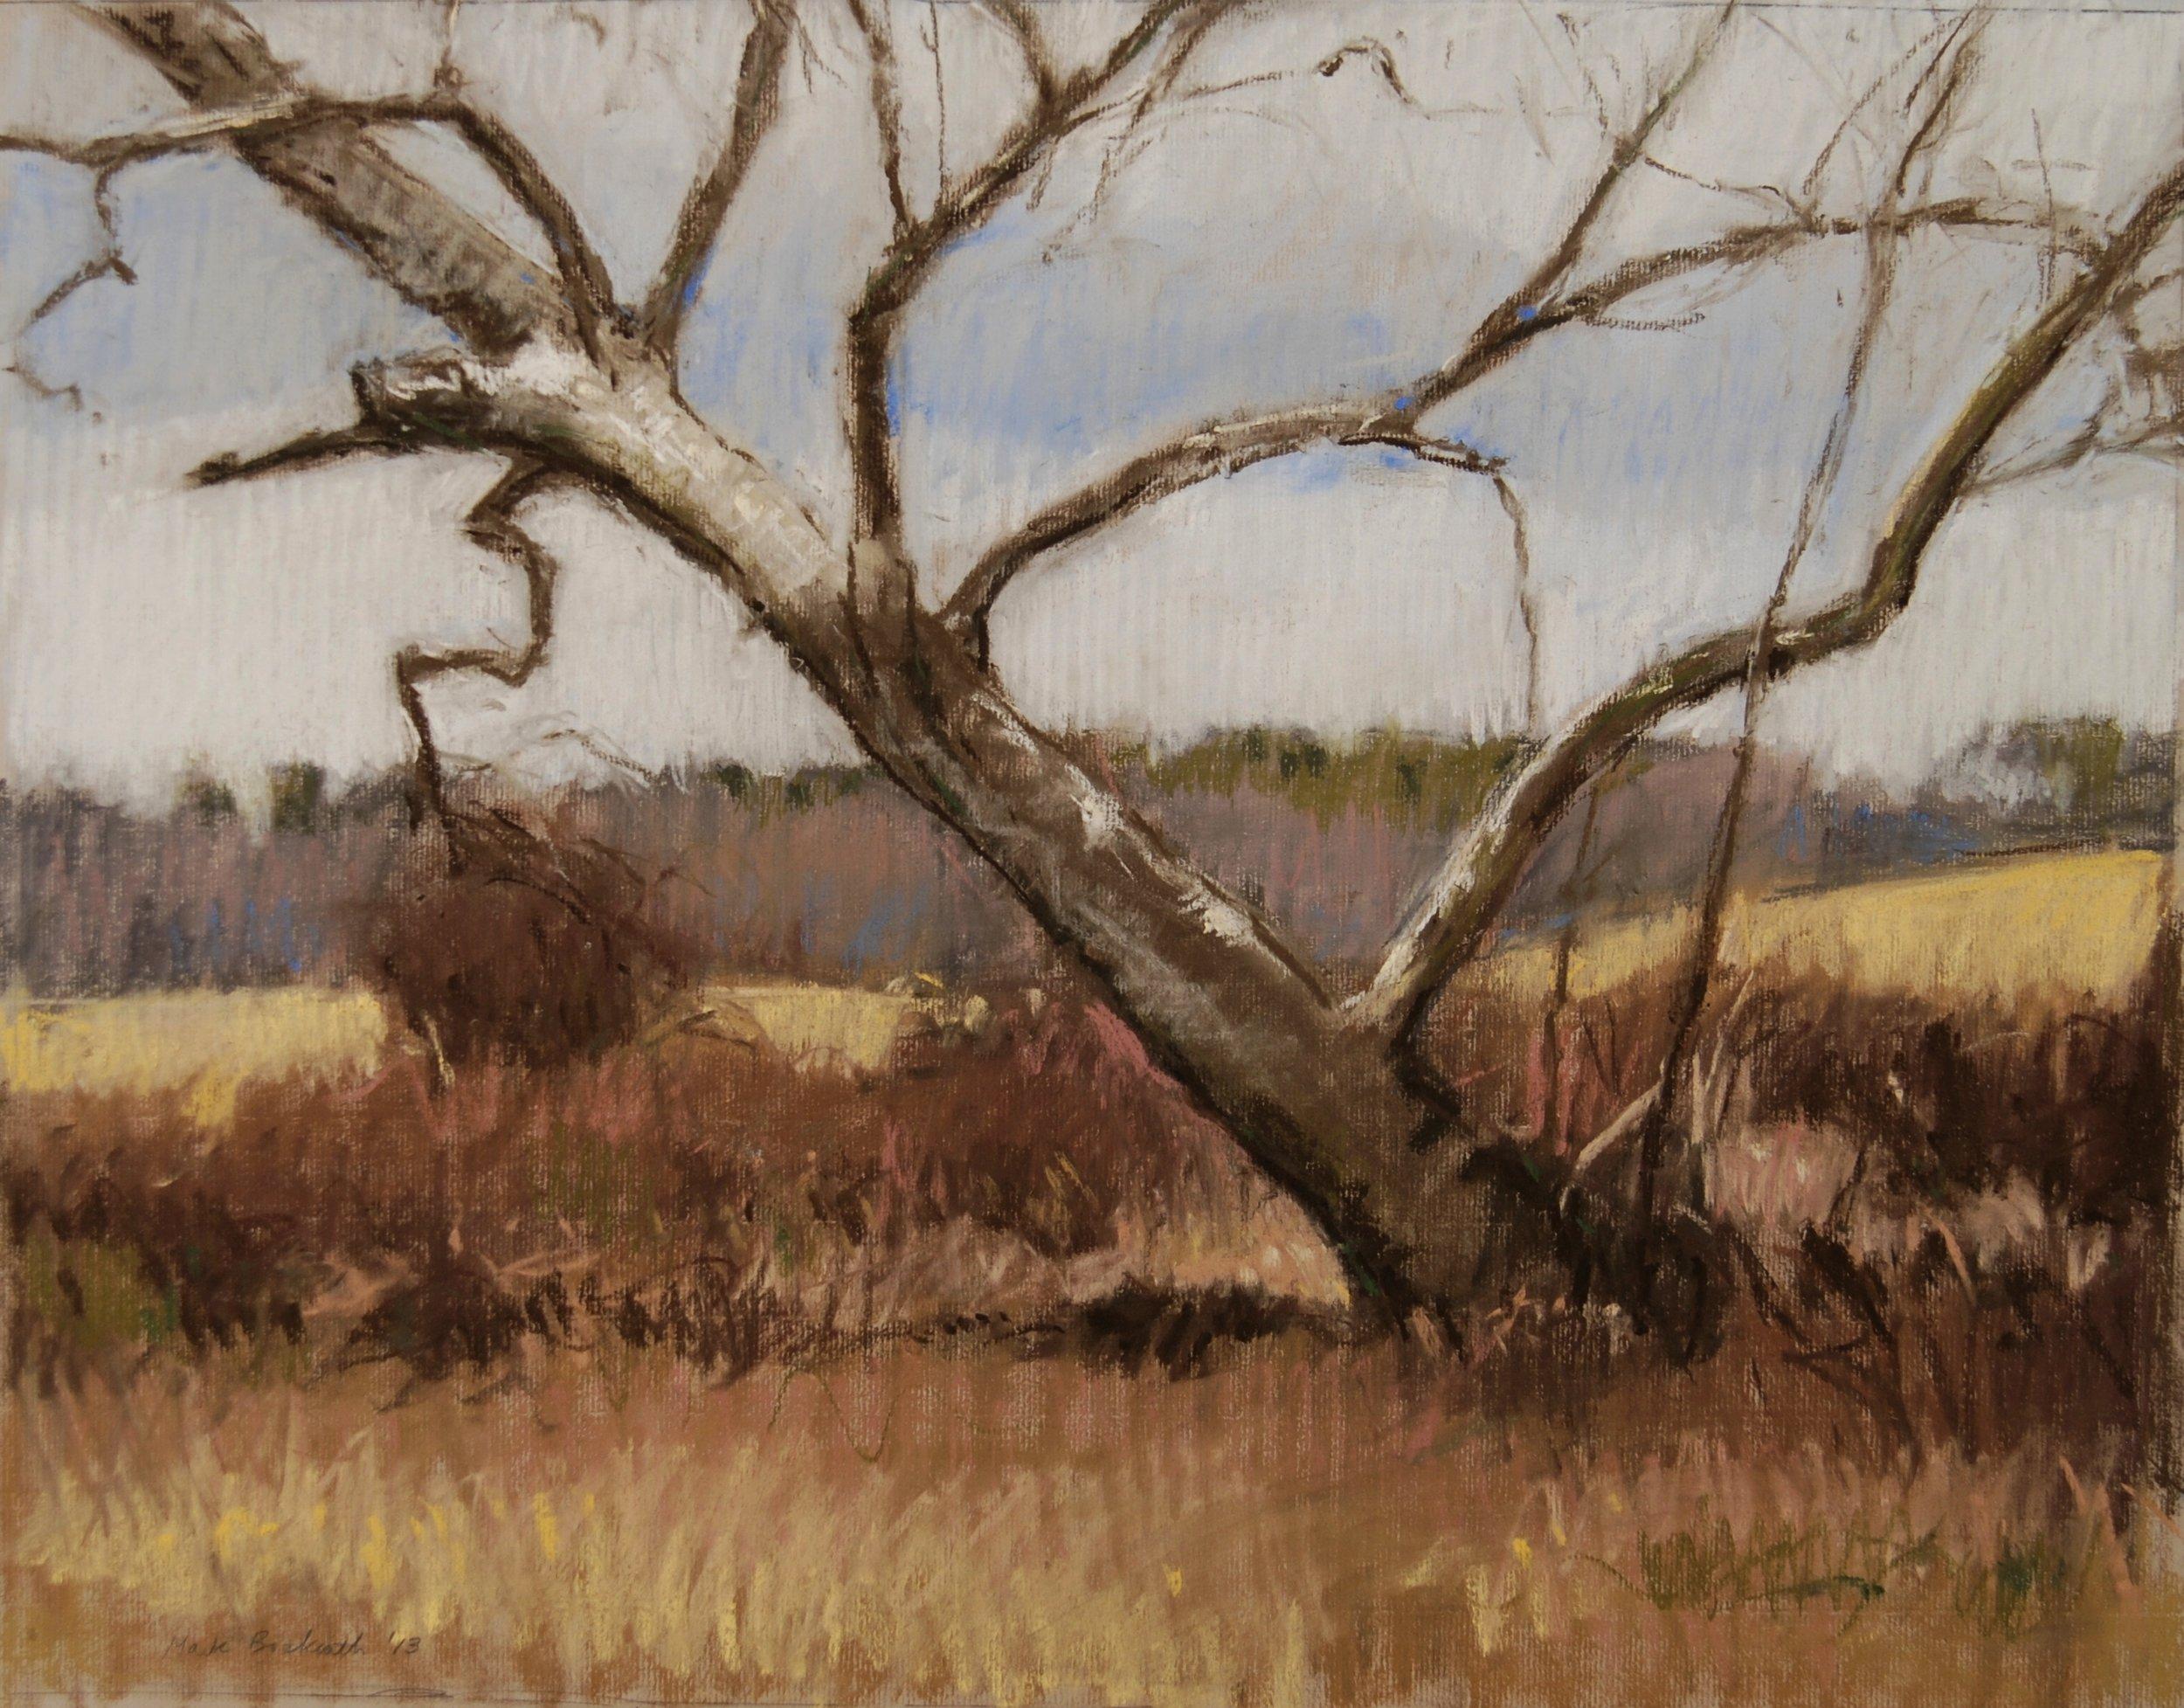 Mark Bockrath, Sycamore, pastel, 2013, 17x22.JPG